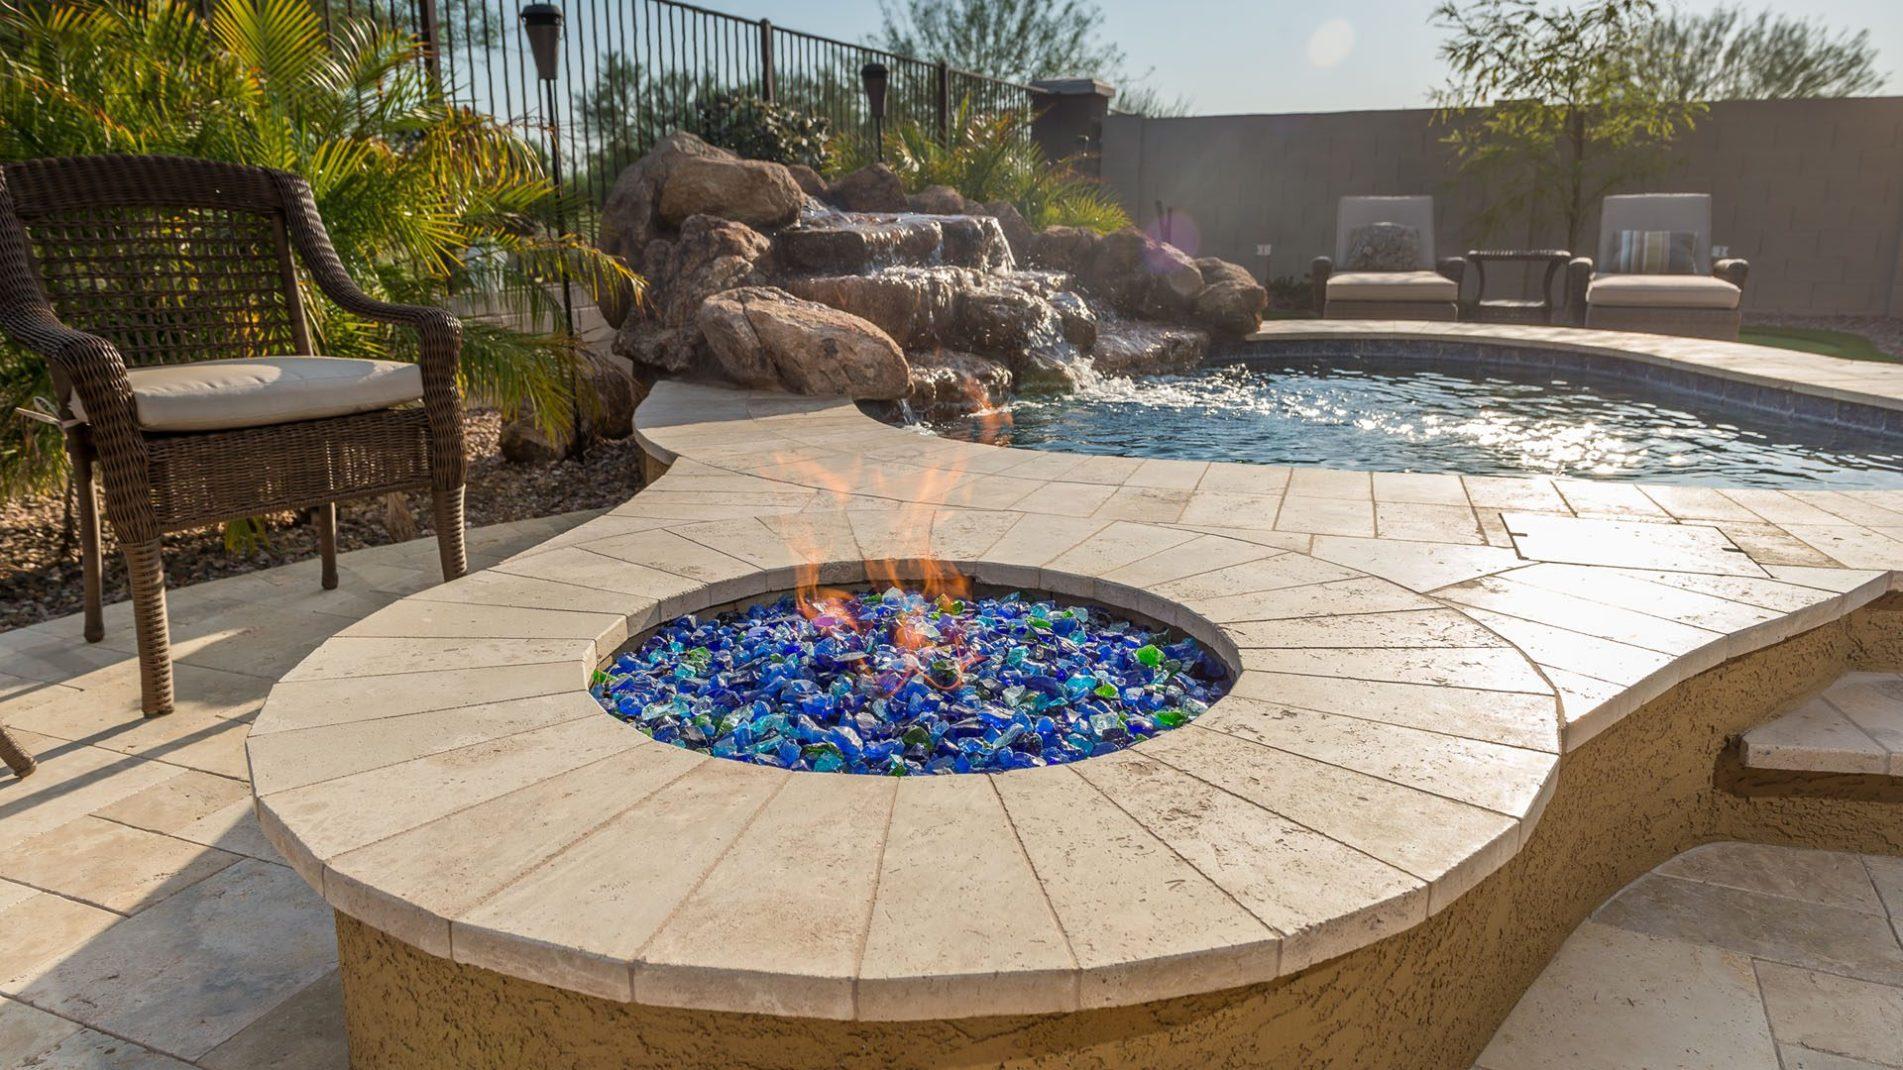 Small Backyard Pool Design Ideas: Queen Creek Ace Fire Pit